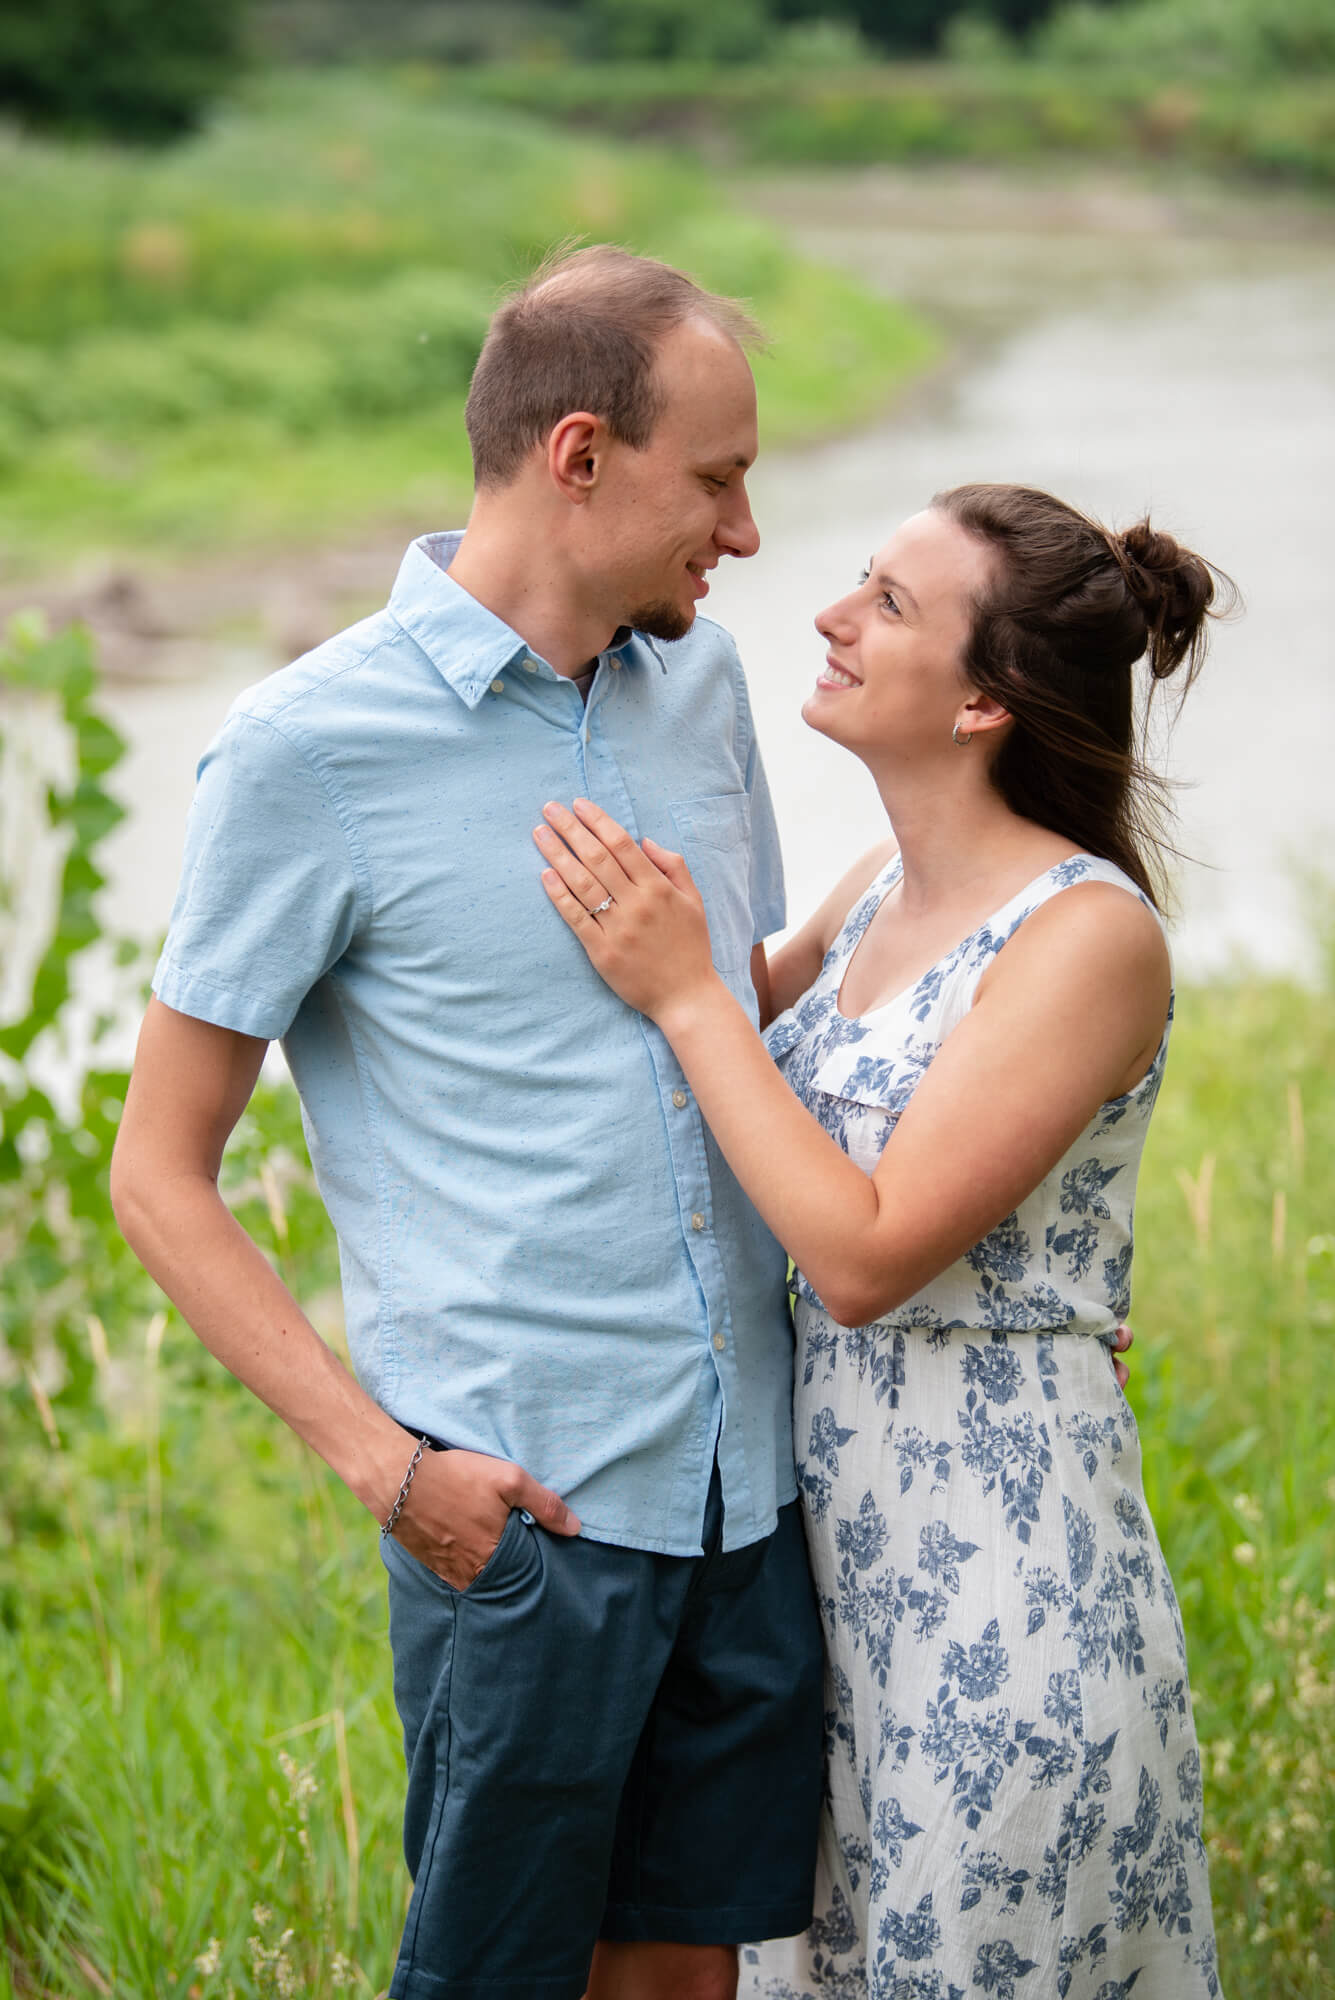 DSC 4664 - John and Faith's Engagement   Fargo, North Dakota